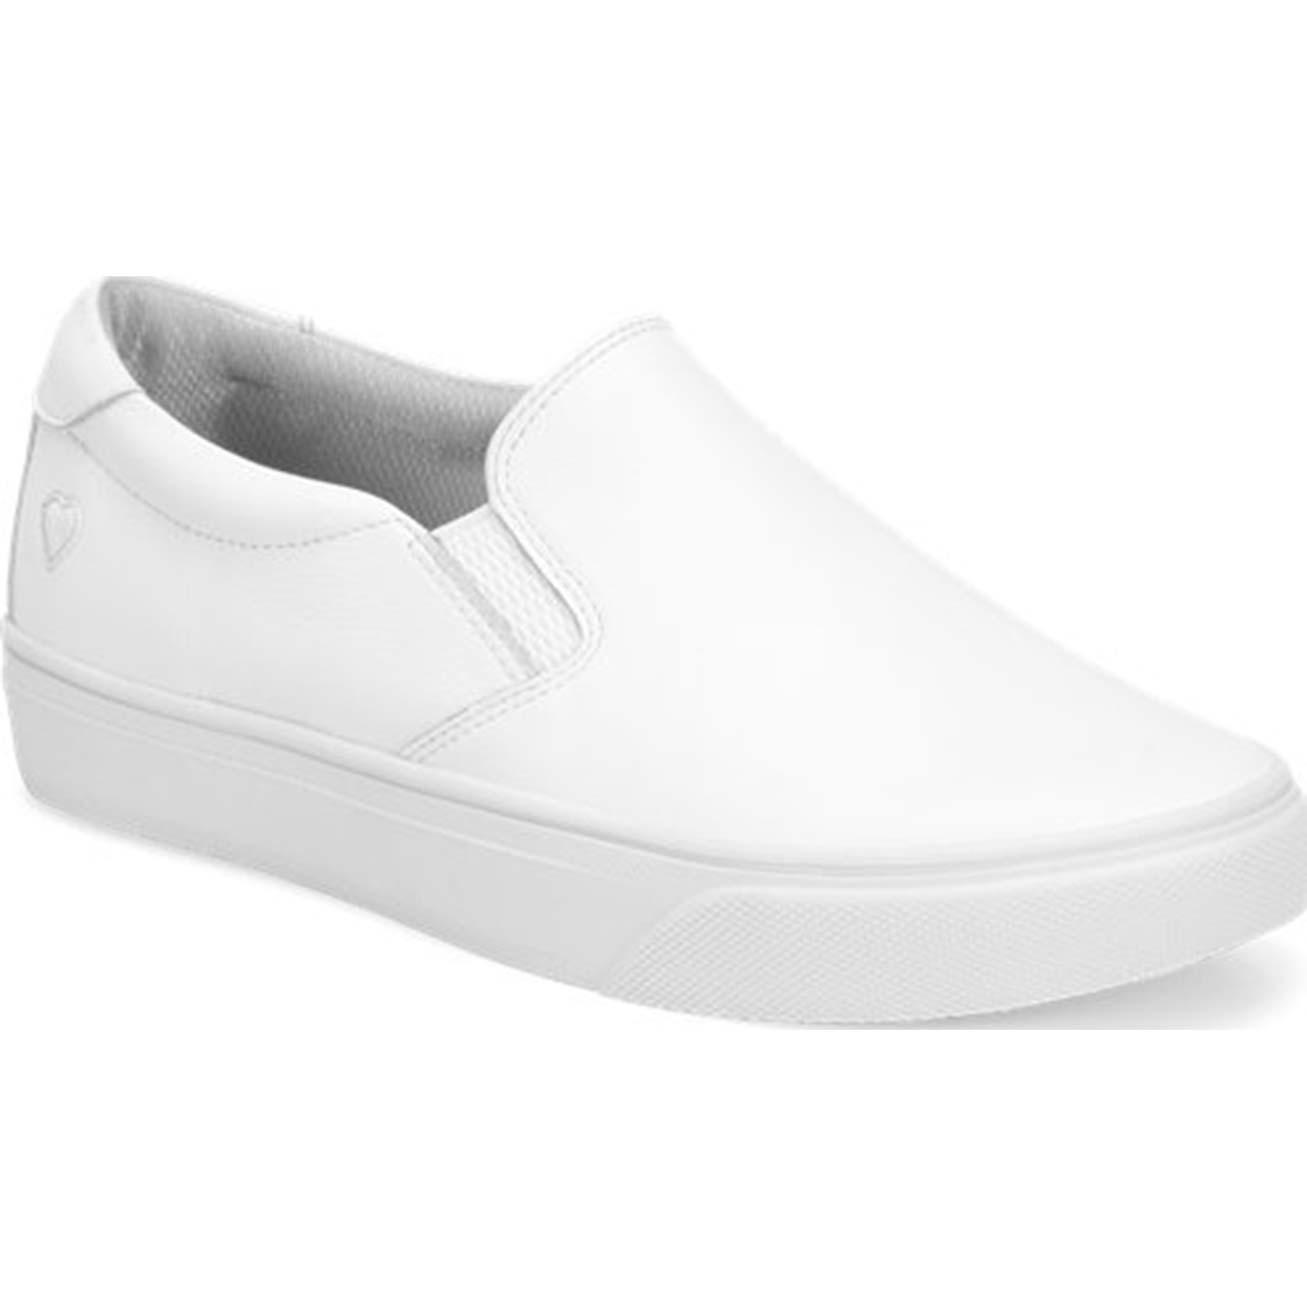 46da96c5b Nurse Mates Align Faxon Women s Slip-Resistant Slip-On ShoeNurse Mates  Align Faxon Women s Slip-Resistant Slip-On Shoe